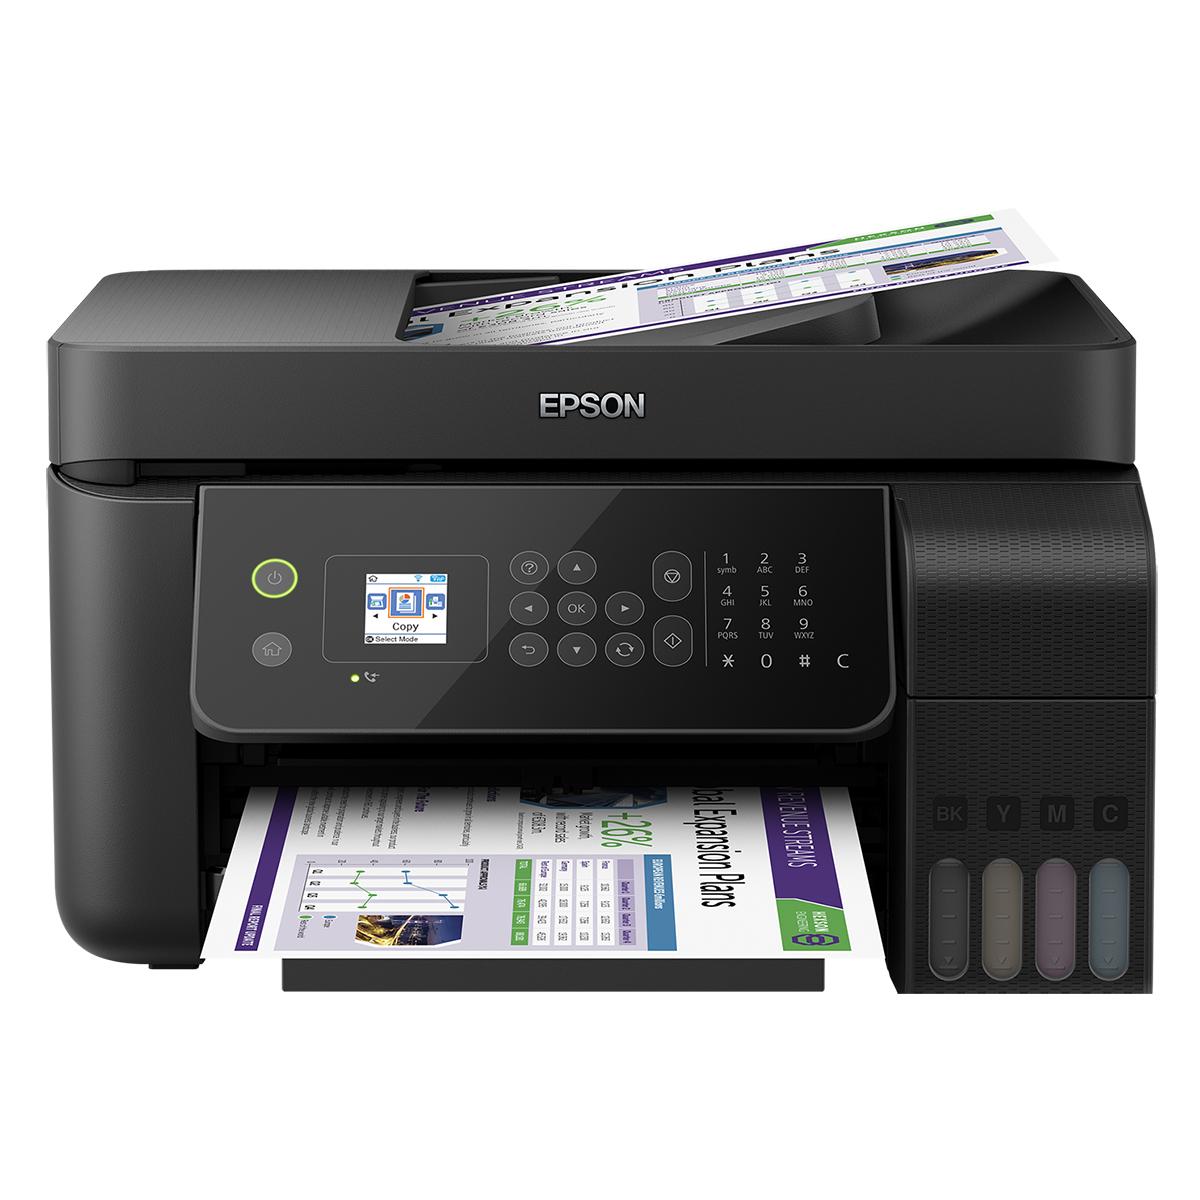 Epson EcoTank ET-4700 A4 Colour Inkjet Multifunction